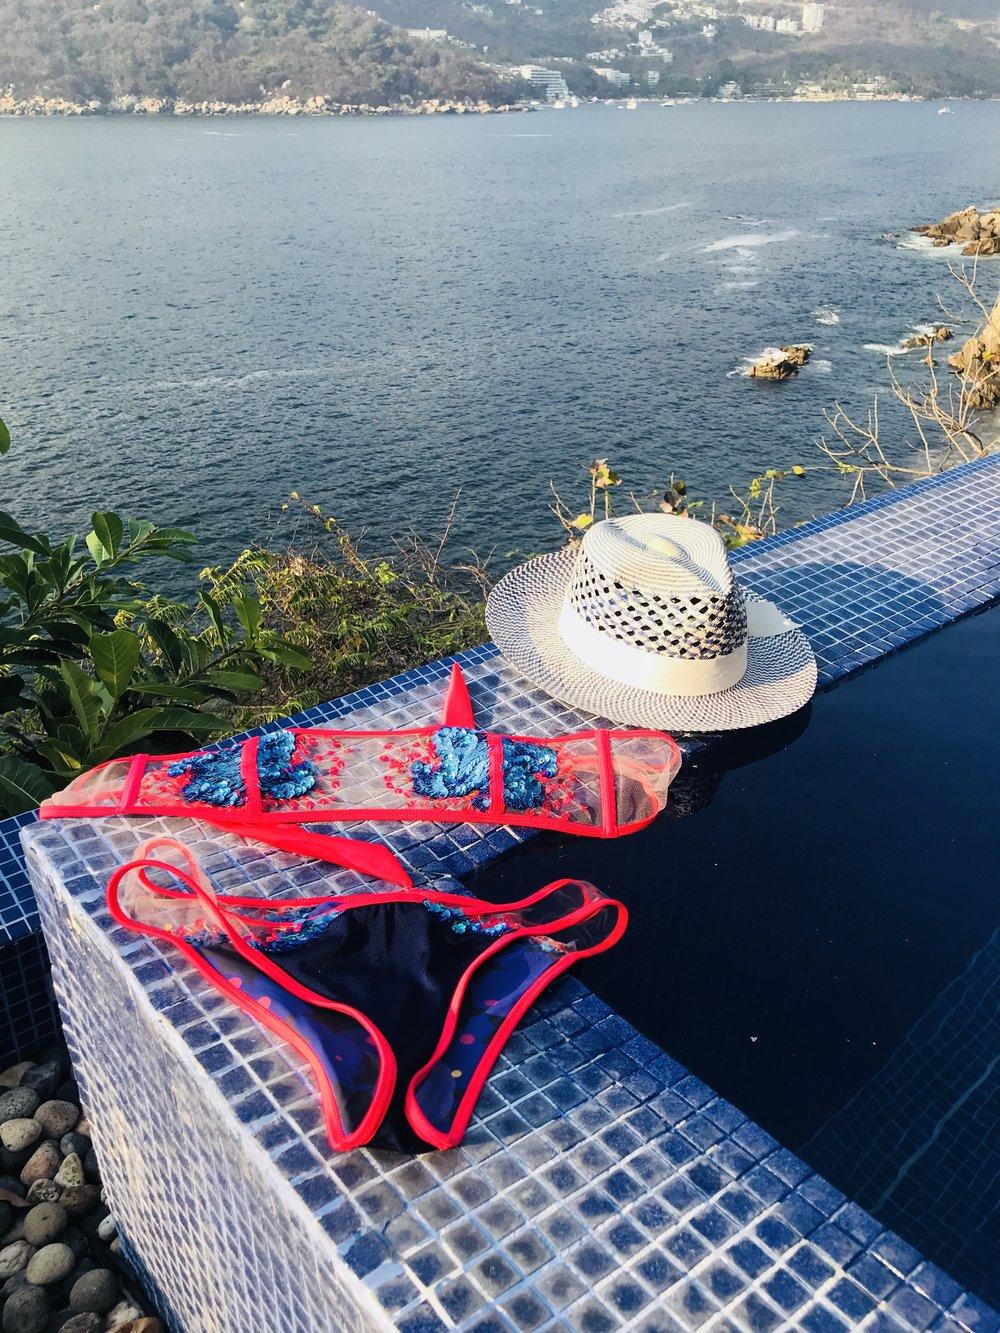 No Neighbors, Private Villa Pool, took a break from sporting my bikini around the resort aka Skinny Dipping is a must :P